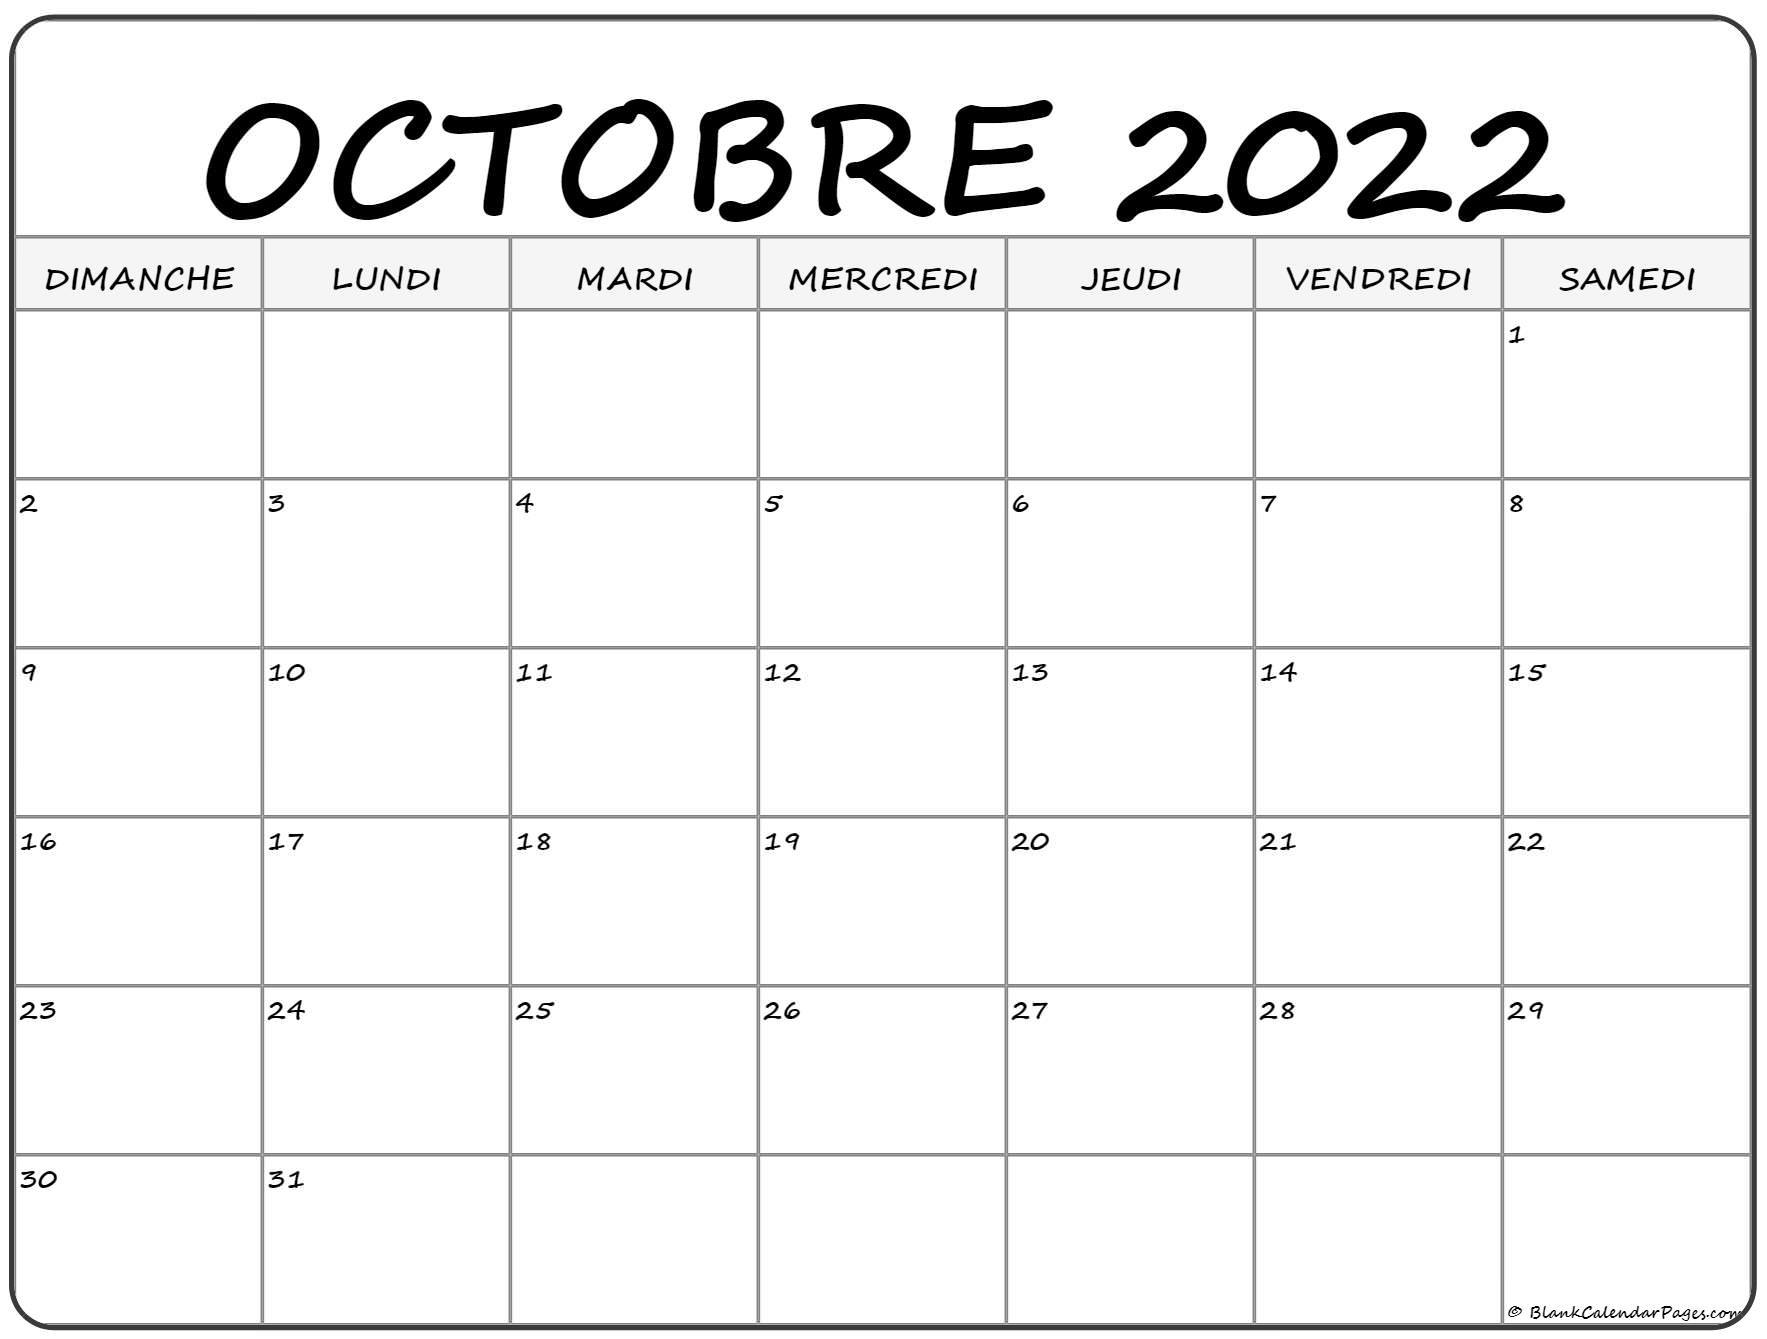 Calendrier 2022 Octobre octobre 2022 calendrier imprimable | Calendrier gratuit